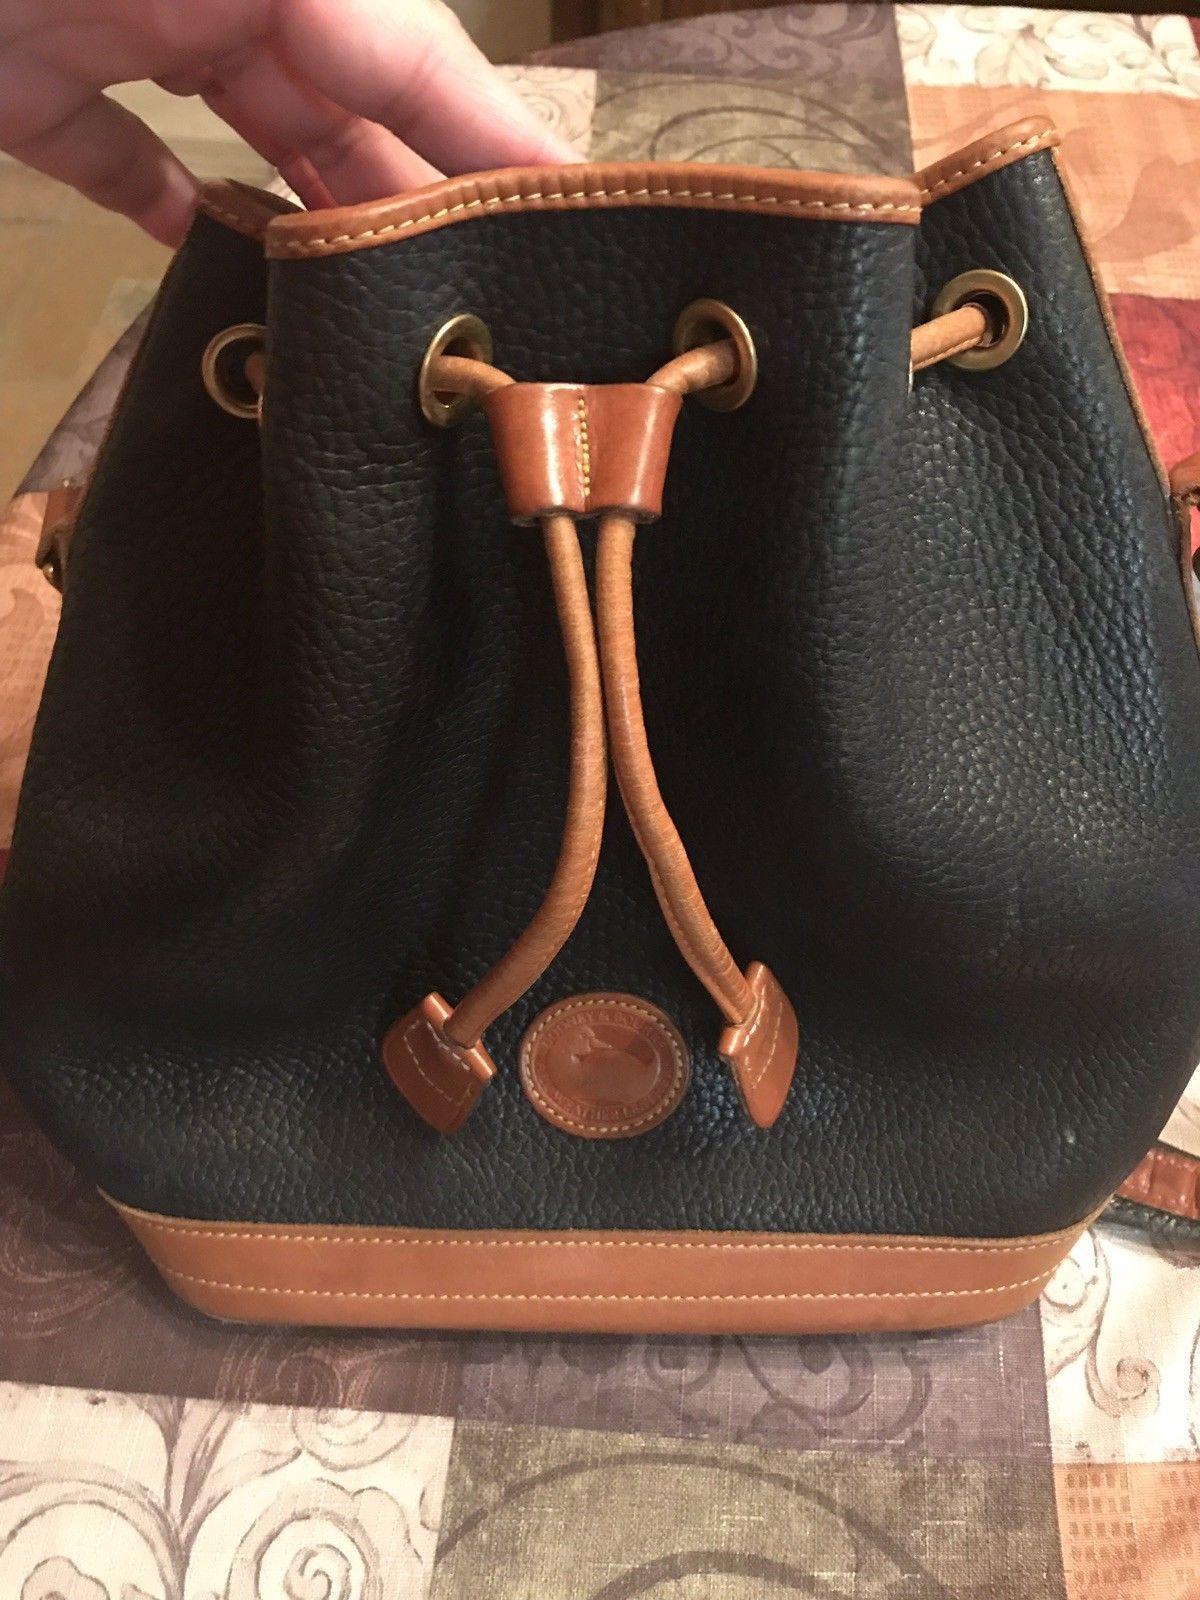 Vintage Dooney and Bourke Teton Drawstring Bucket Bag Black Tan Saddle  Clean.  120.0  dooney 08f094ec058f6